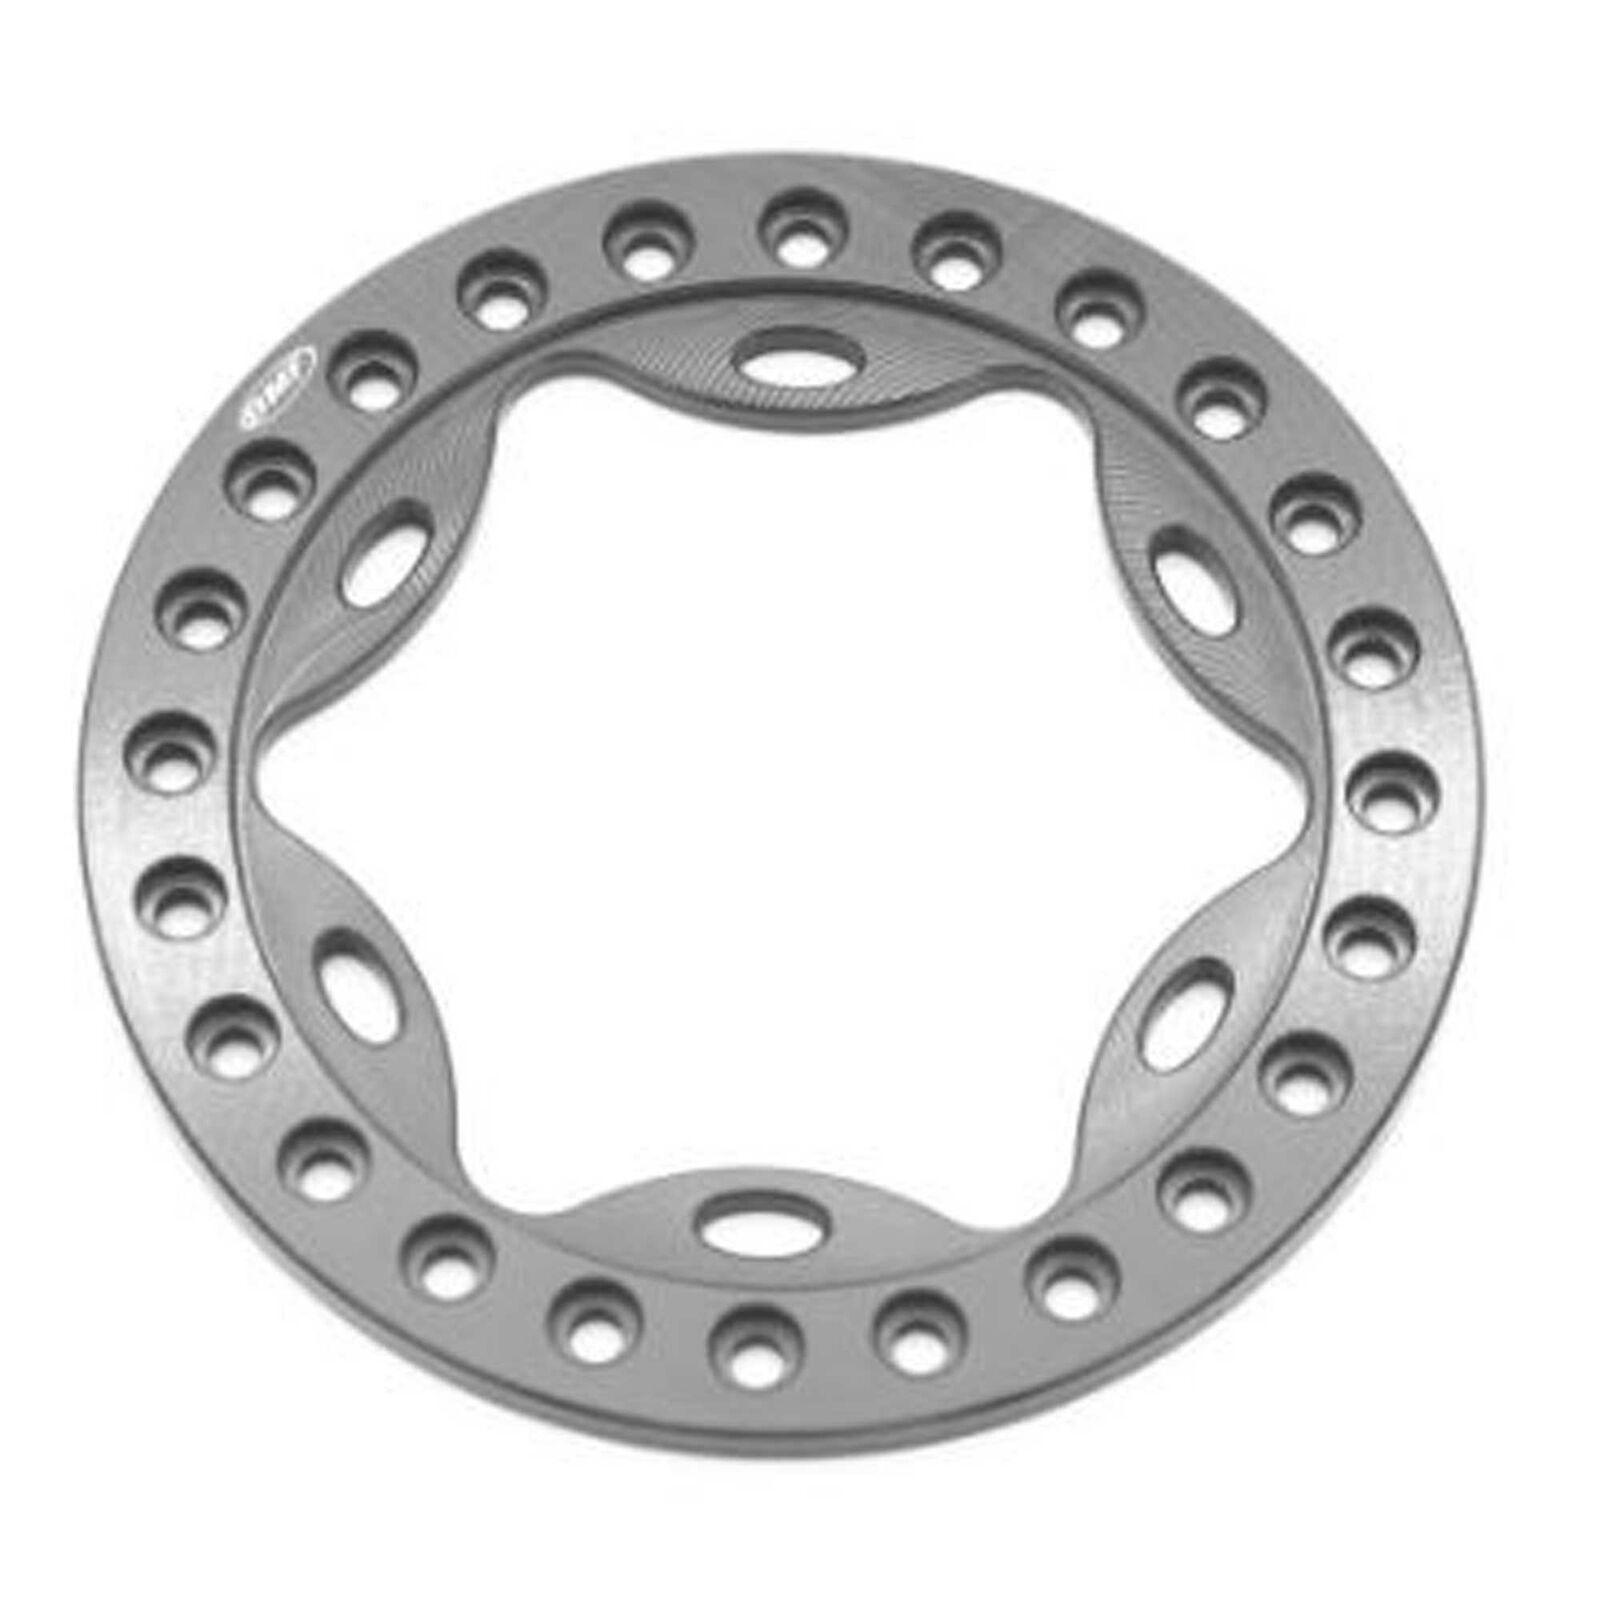 OMF 1.9 Scallop Beadlock Grey Anodized